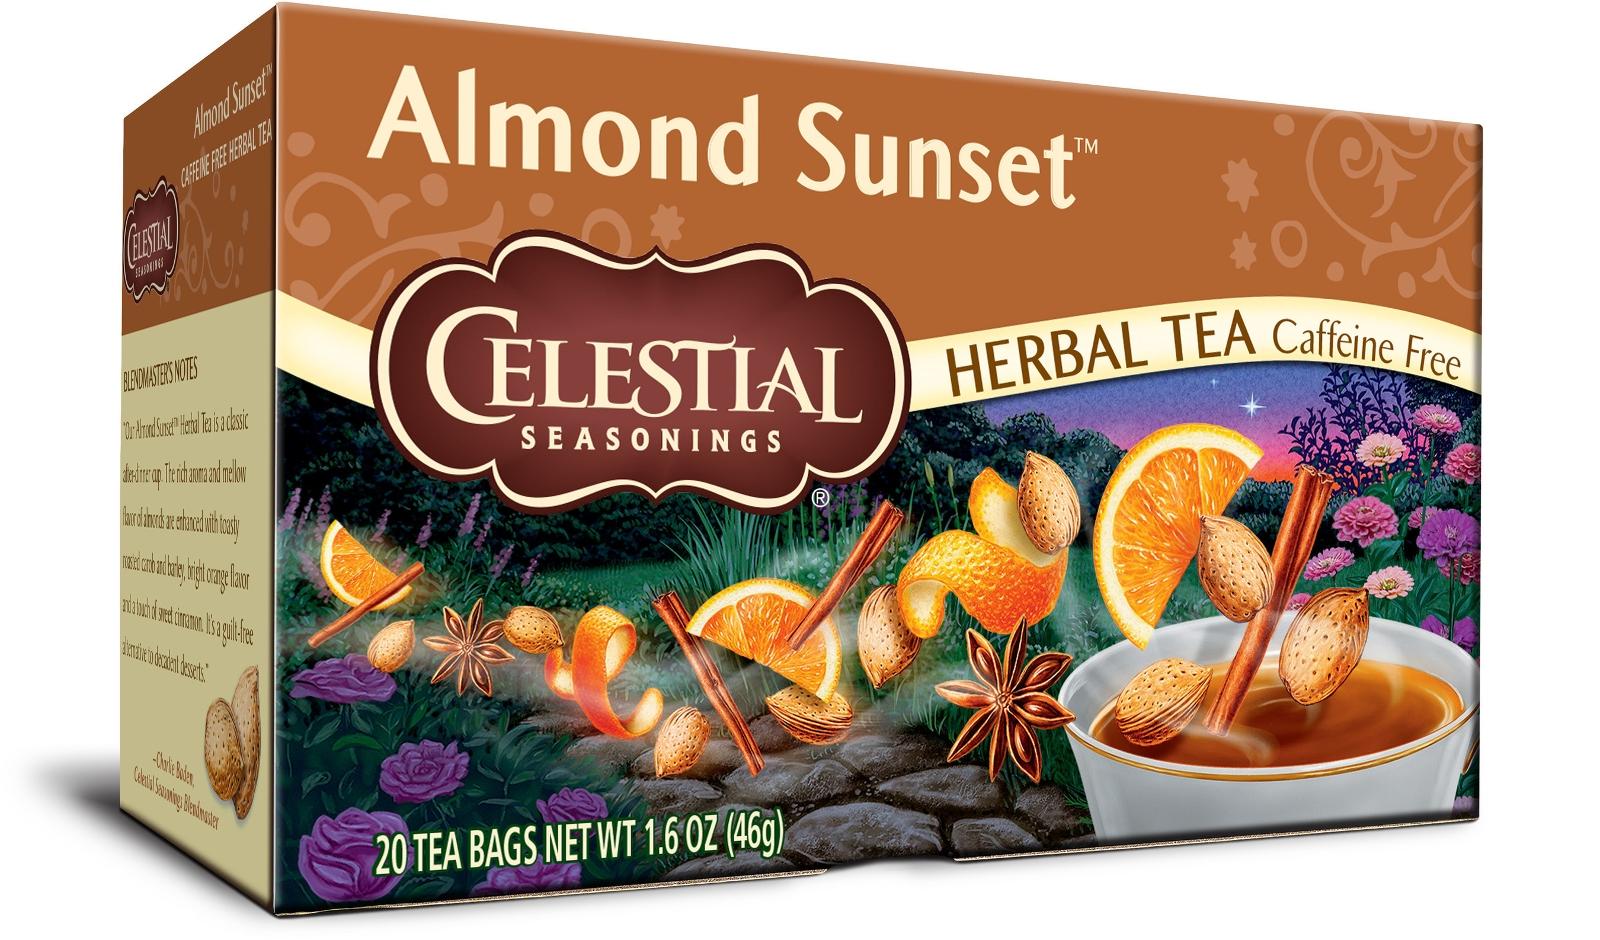 A box of Almond Sunset flavor Celestial Seasonings tea